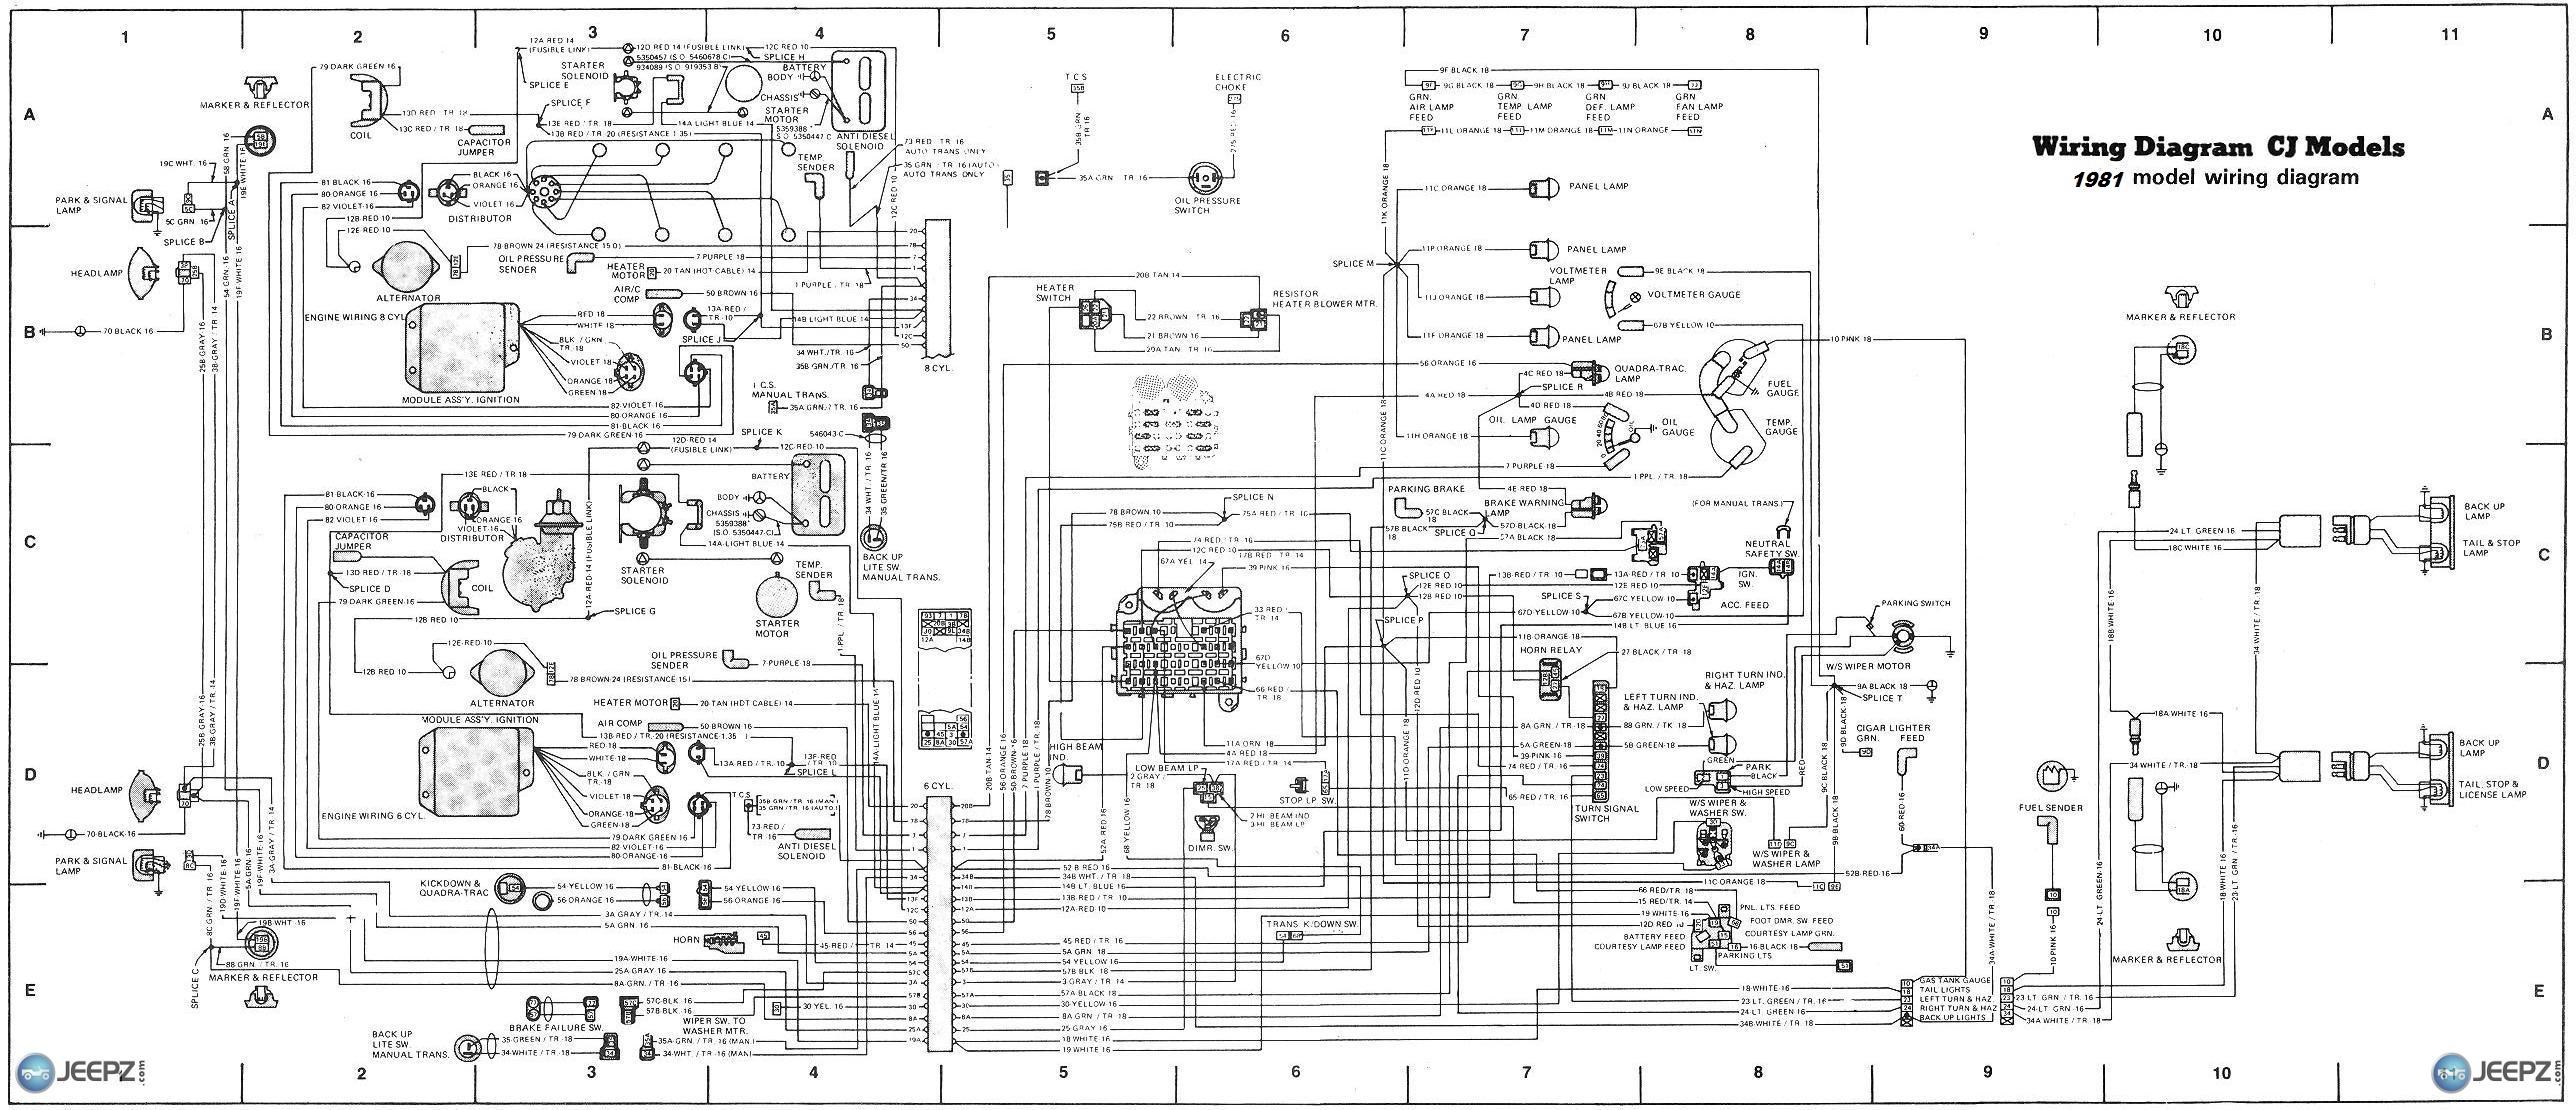 Fine Cj7 Painless Wiring Diagram Online Wiring Diagram Wiring Cloud Licukshollocom